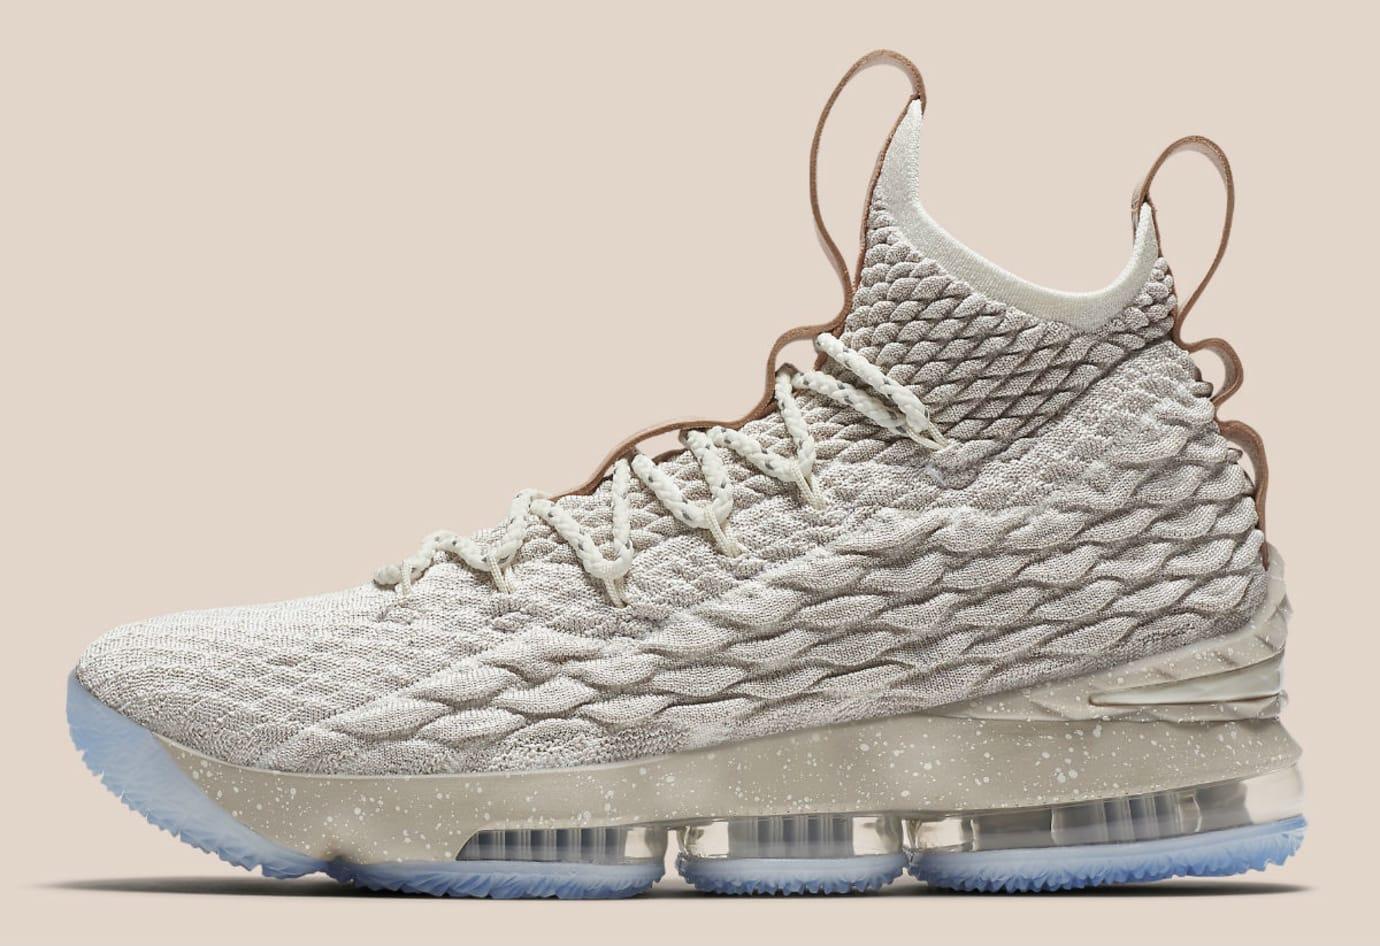 Nike LeBron 15 Ghost Release Date Profile 897649-200